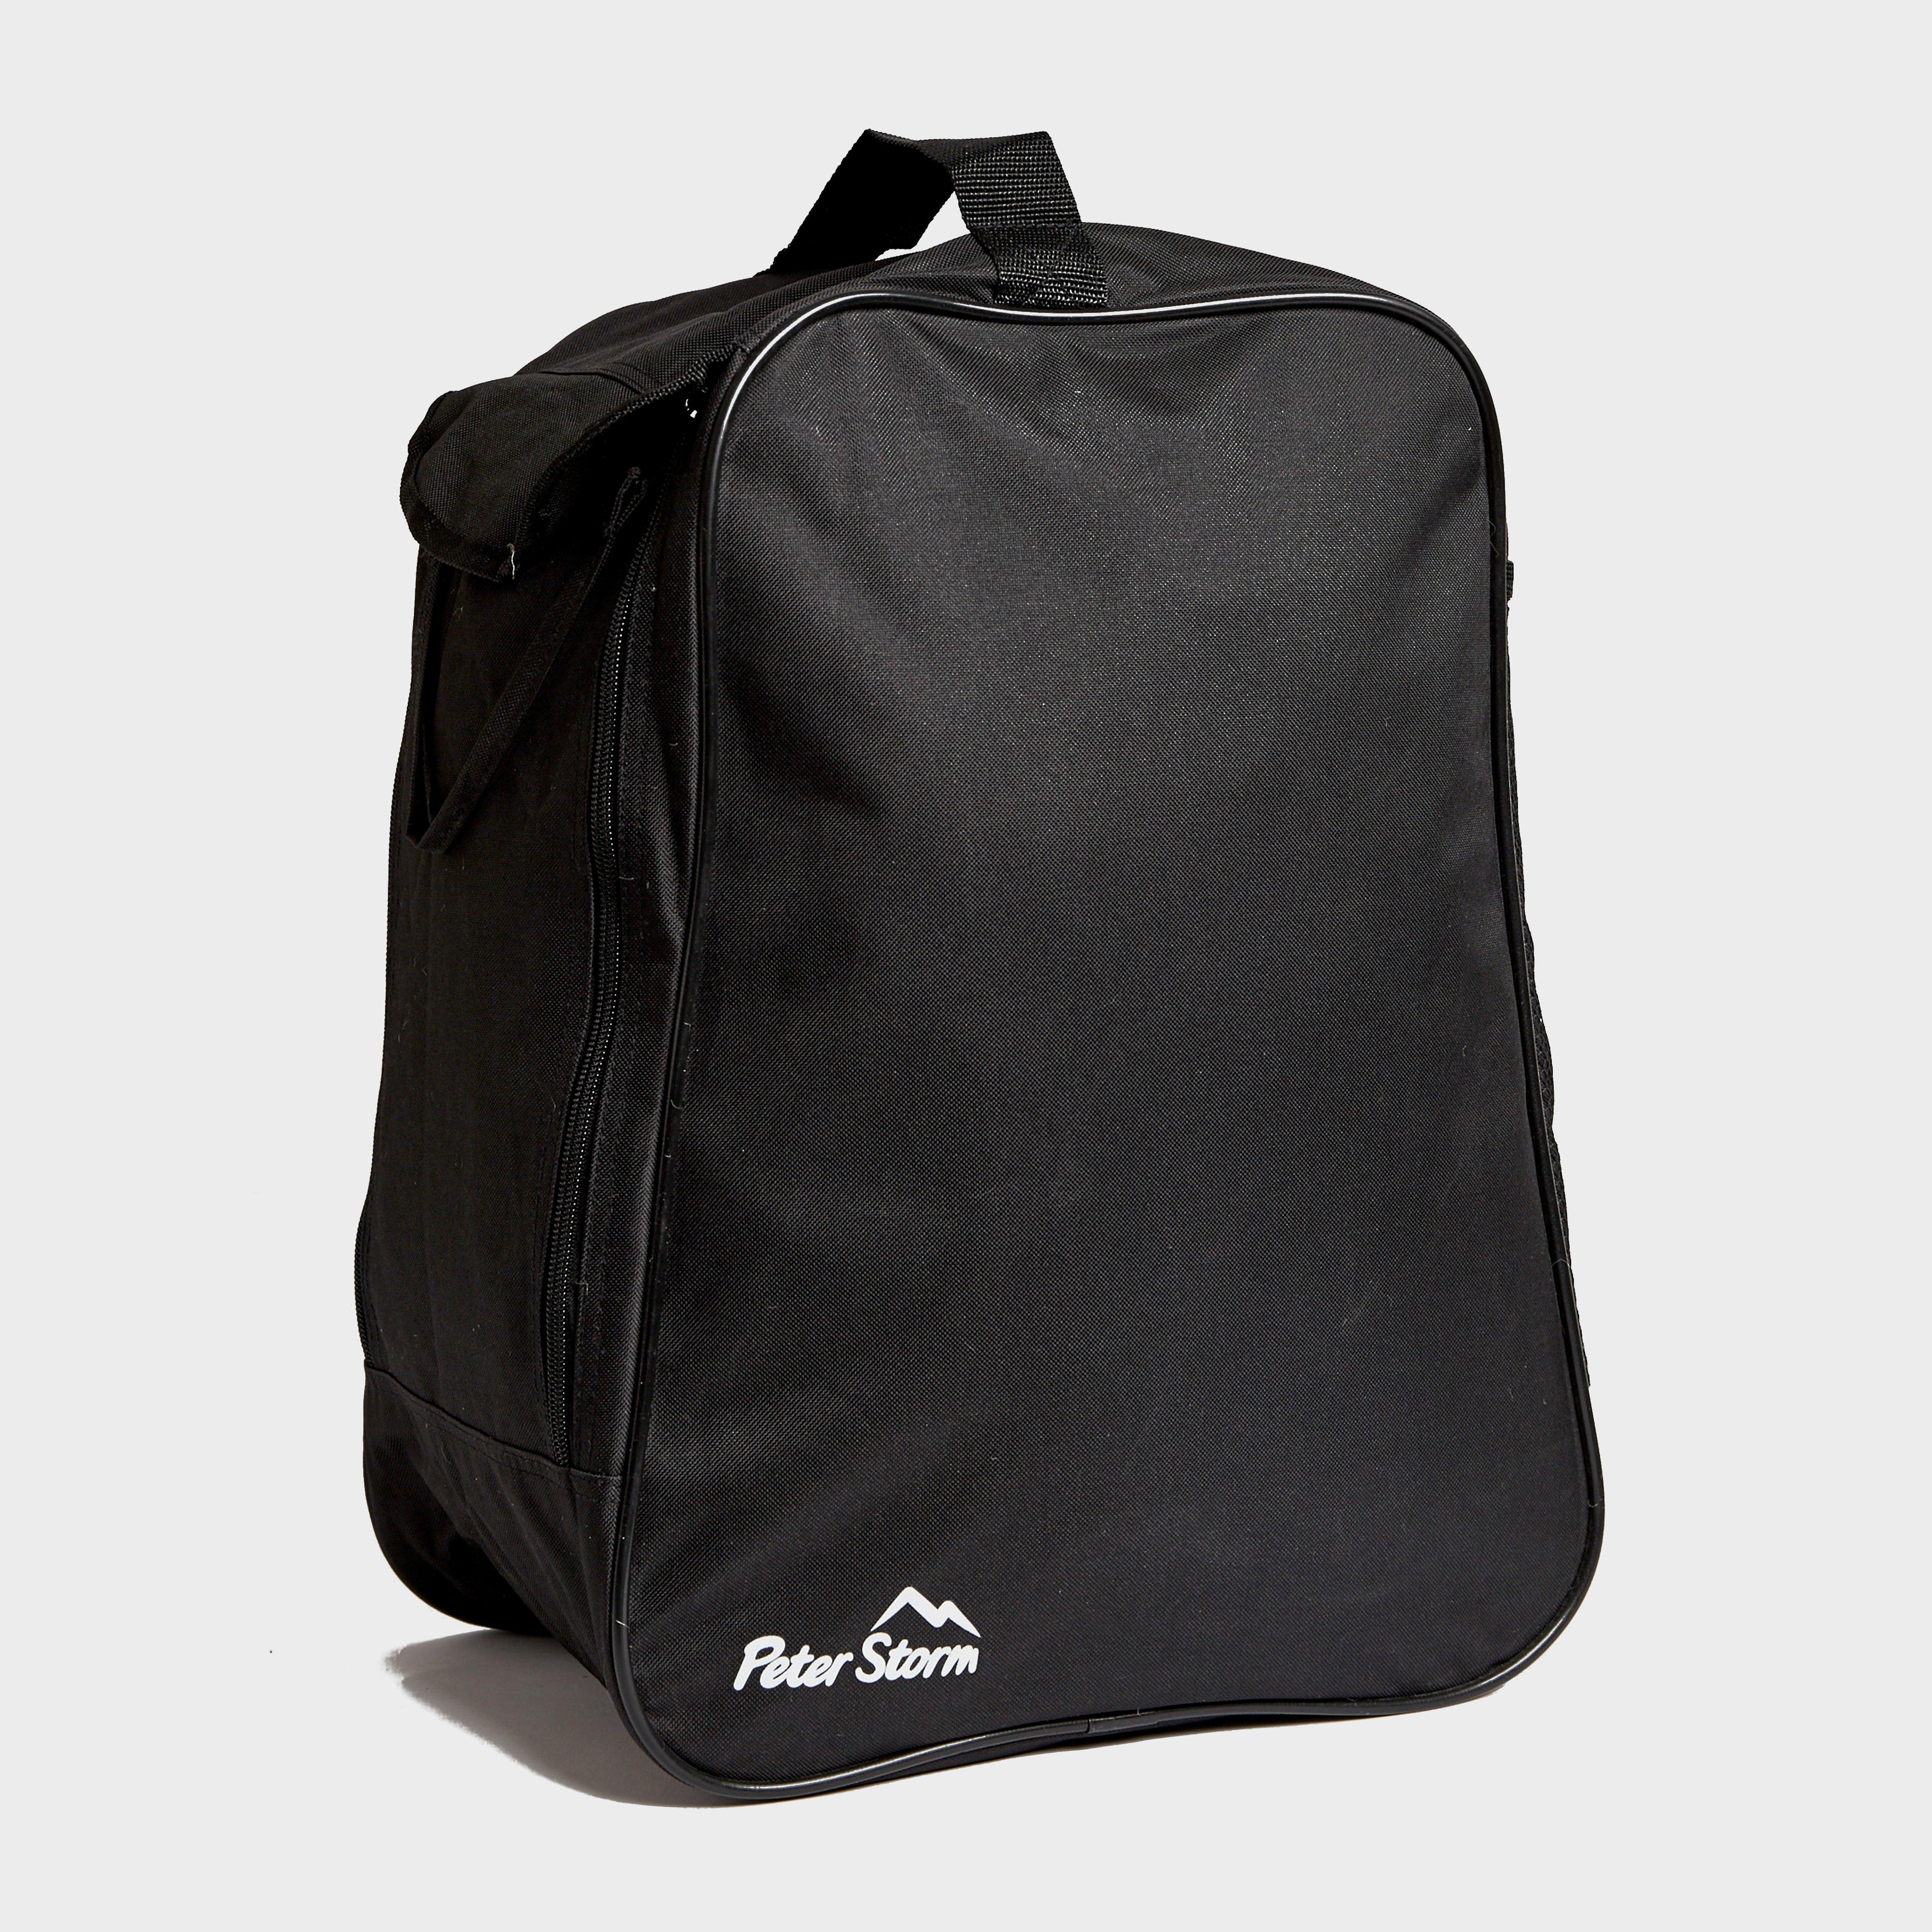 Peter Storm Ps Wellington Bag - Black/blk  Black/blk